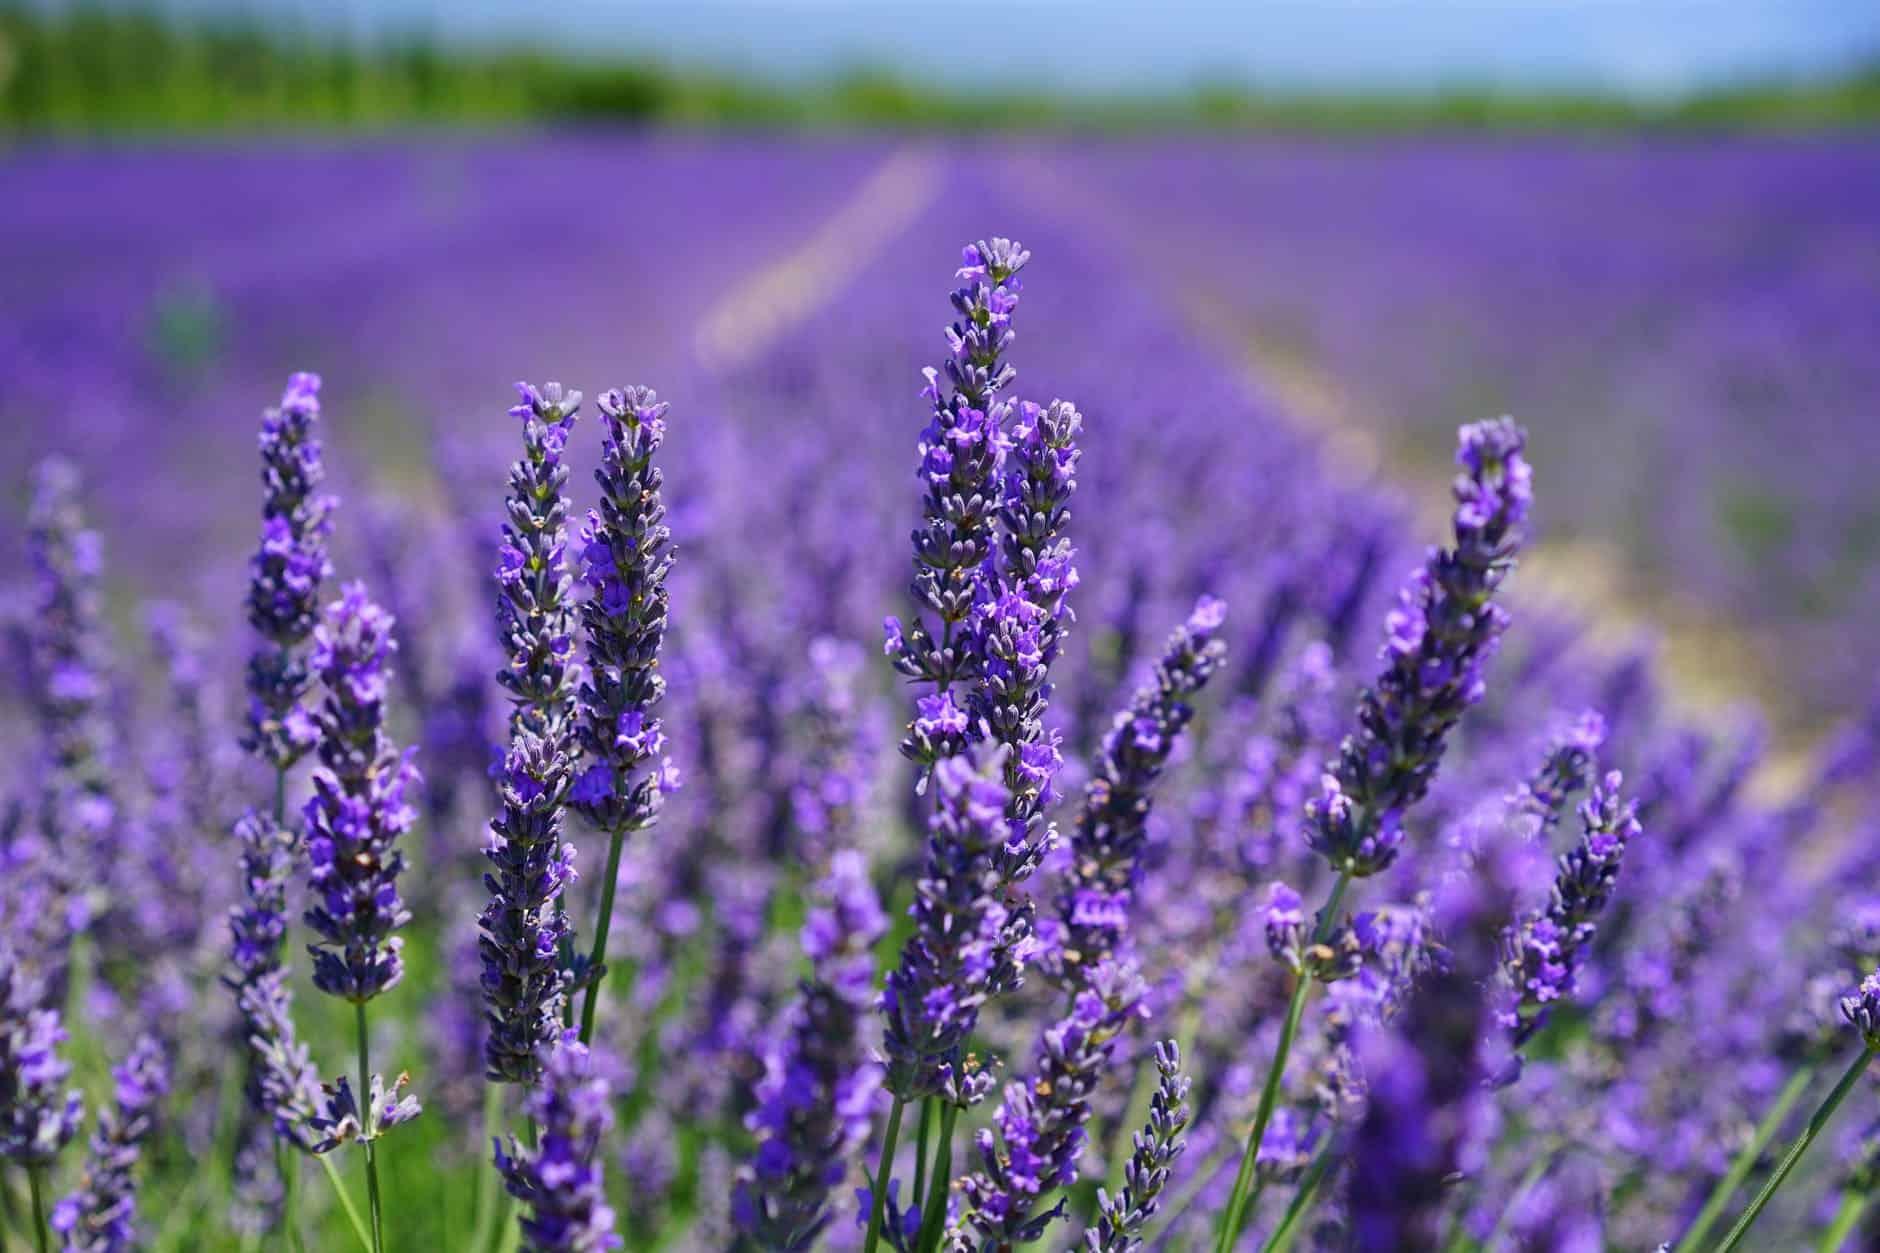 Lavender Farms in Virginia | The Common Traveler purple petal flowers focus photograph |Lavender Farms in Virginia by popular US travel blog, The Common Traveler: image of purple lavender.